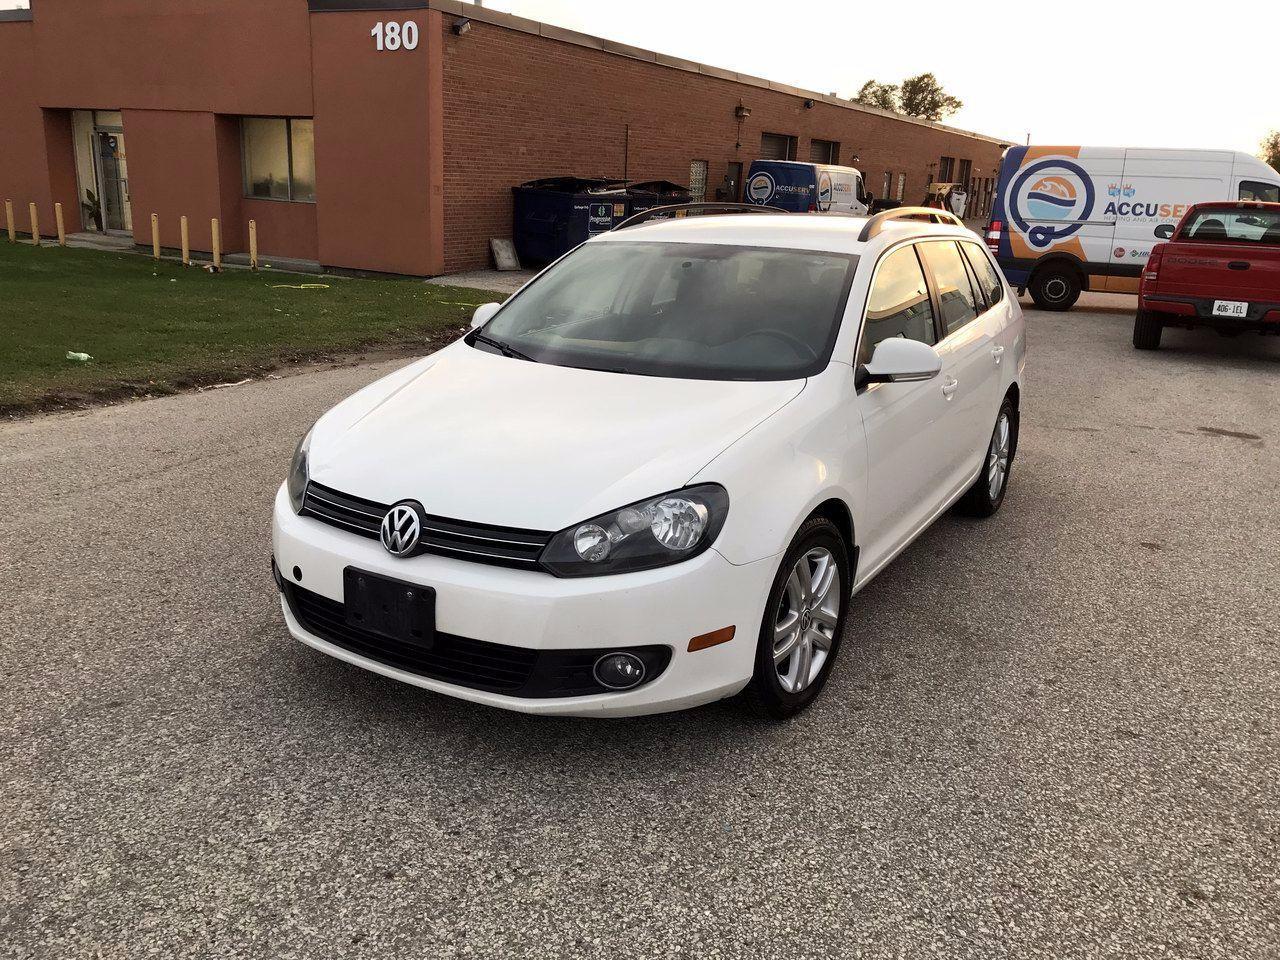 Photo of White 2011 Volkswagen Golf Wagon